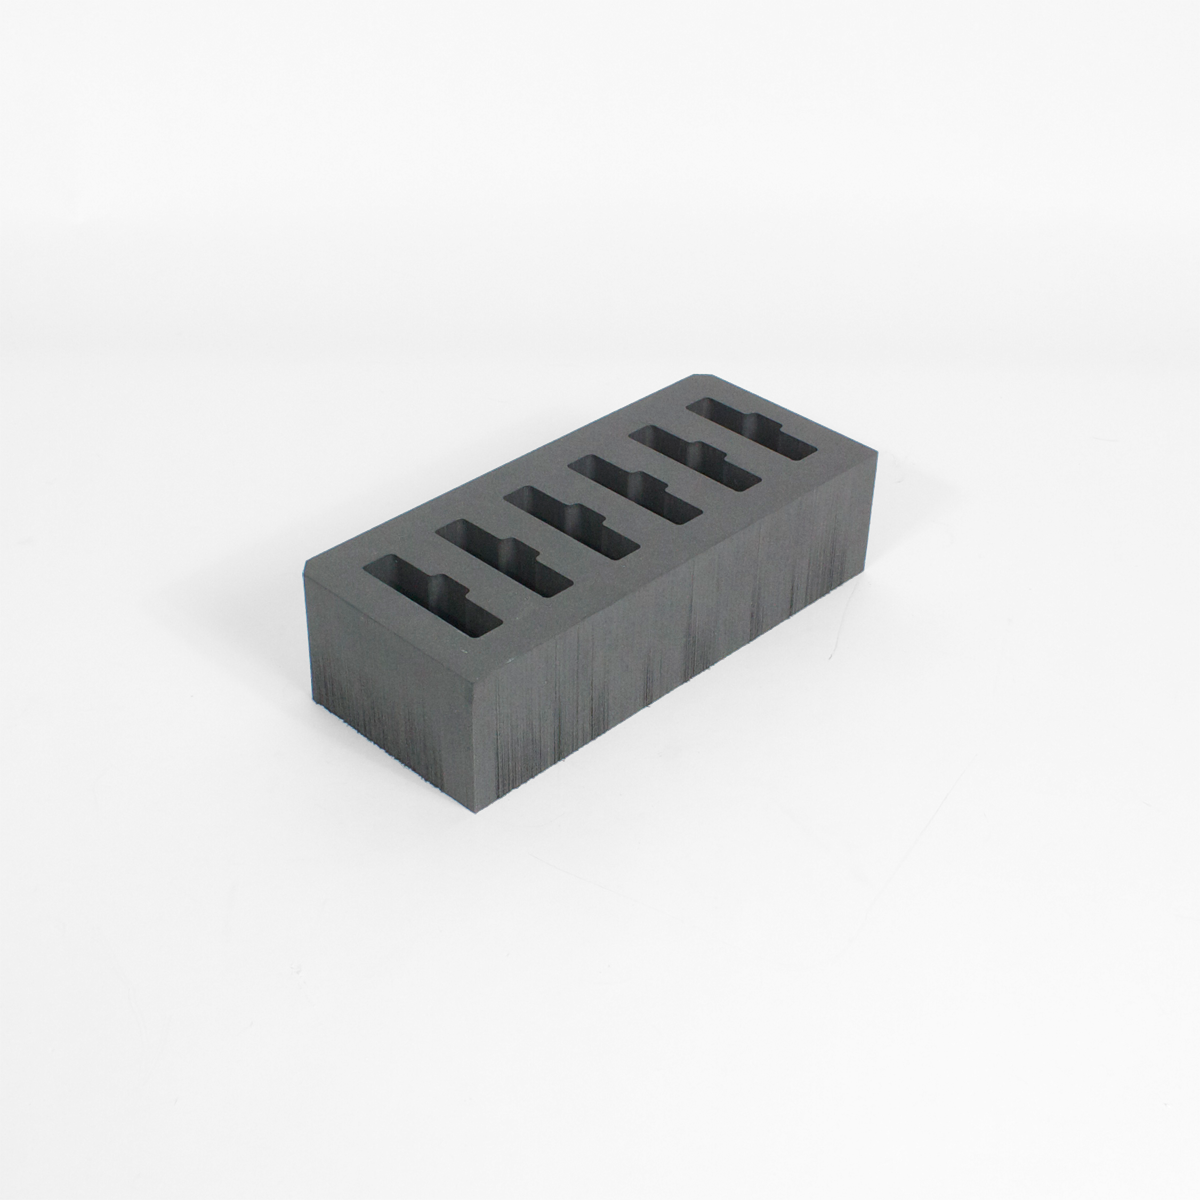 W-CCS 029 DW Small Digi-Wave™ Briefcase